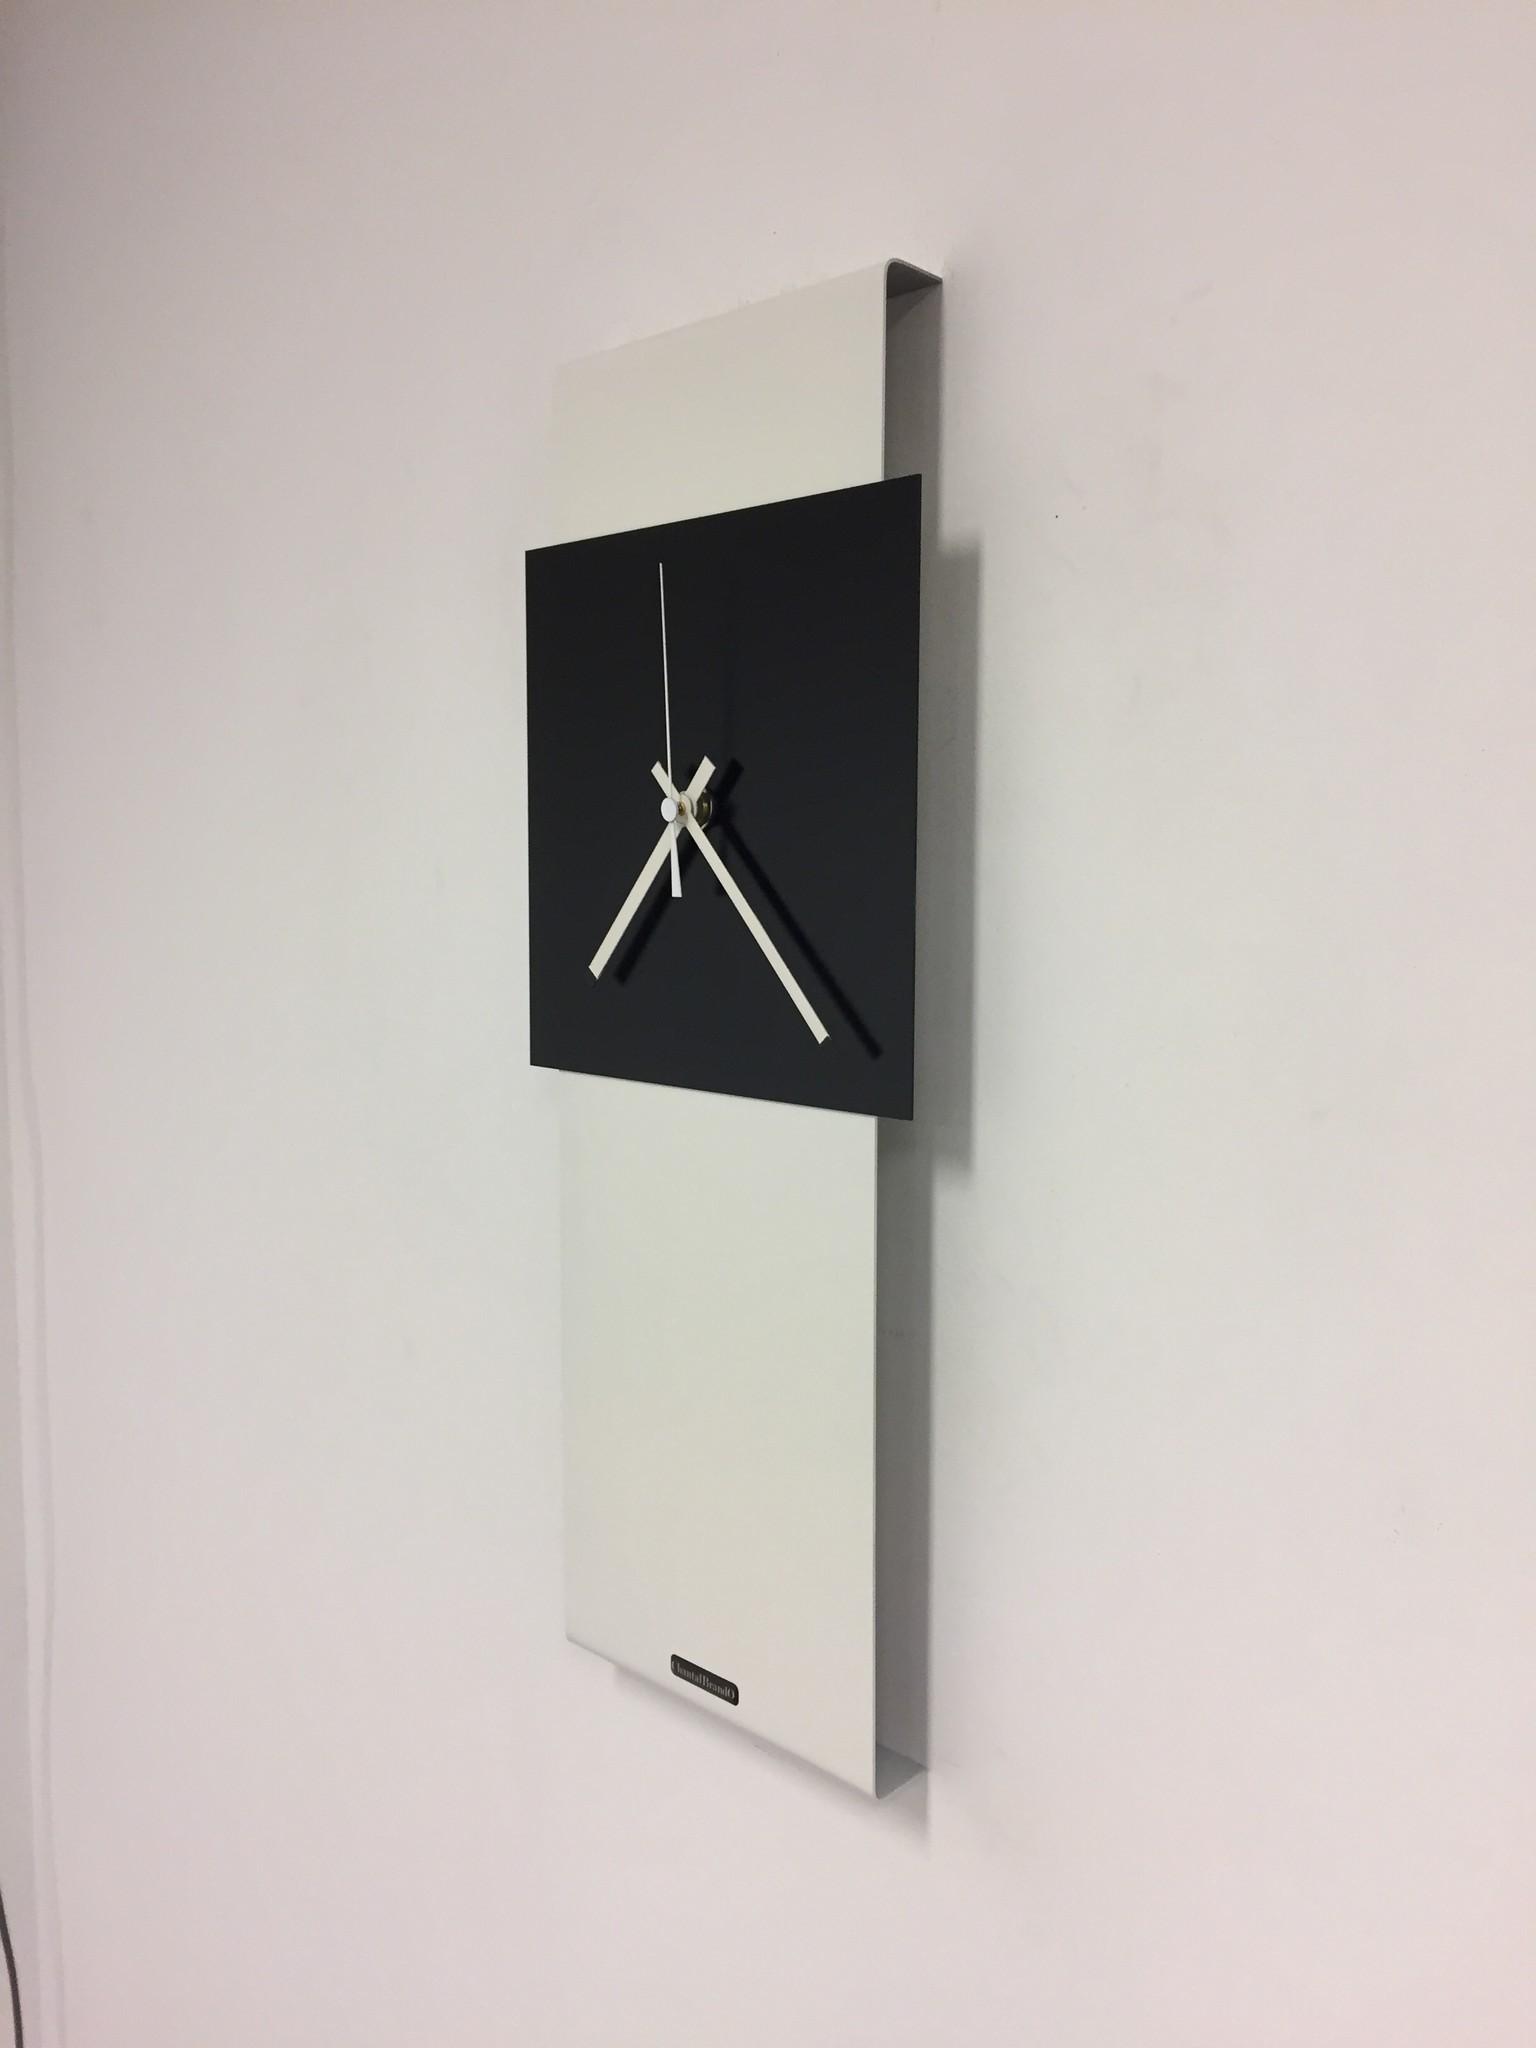 ChantalBrandO Wandklok LaBrand Export Line White & Black Square Modern Dutch Design